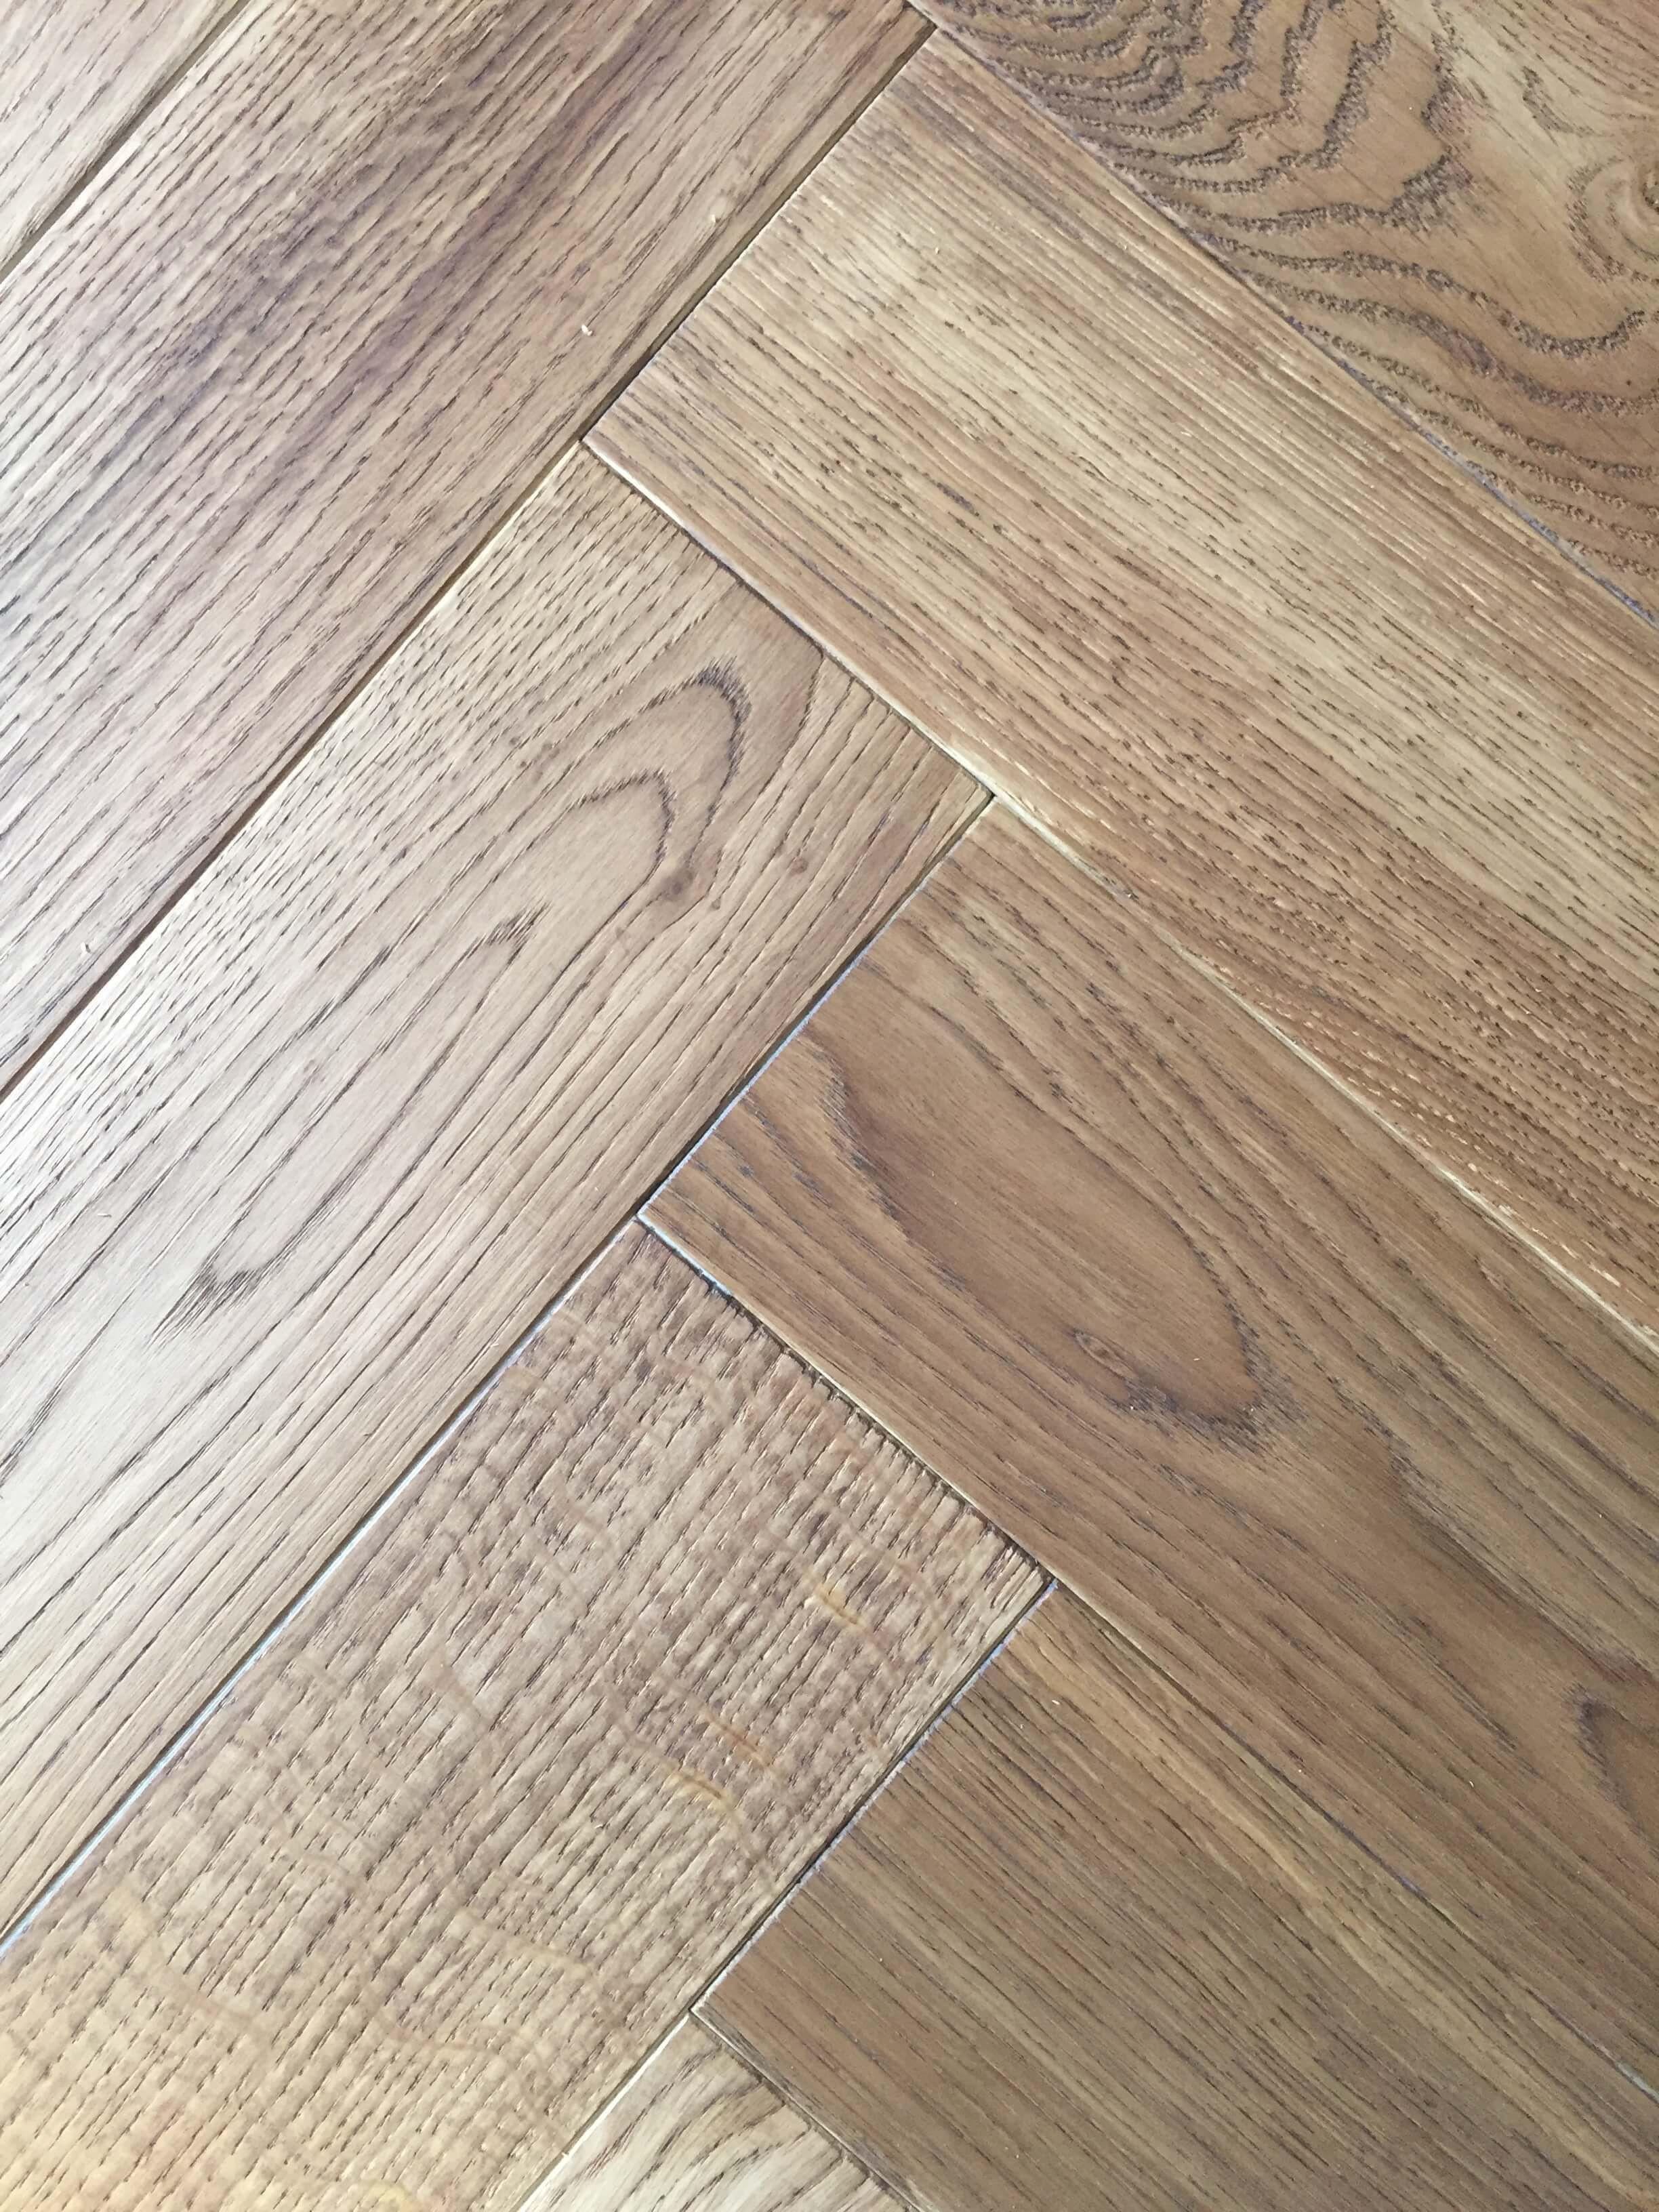 12 Best Hardwood Floor Refinishing Reviews 2021 free download hardwood floor refinishing reviews of elegant hardwood floor repairs inspiration pertaining to hardwood floor repair new decorating an open floor plan living room awesome design plan 0d